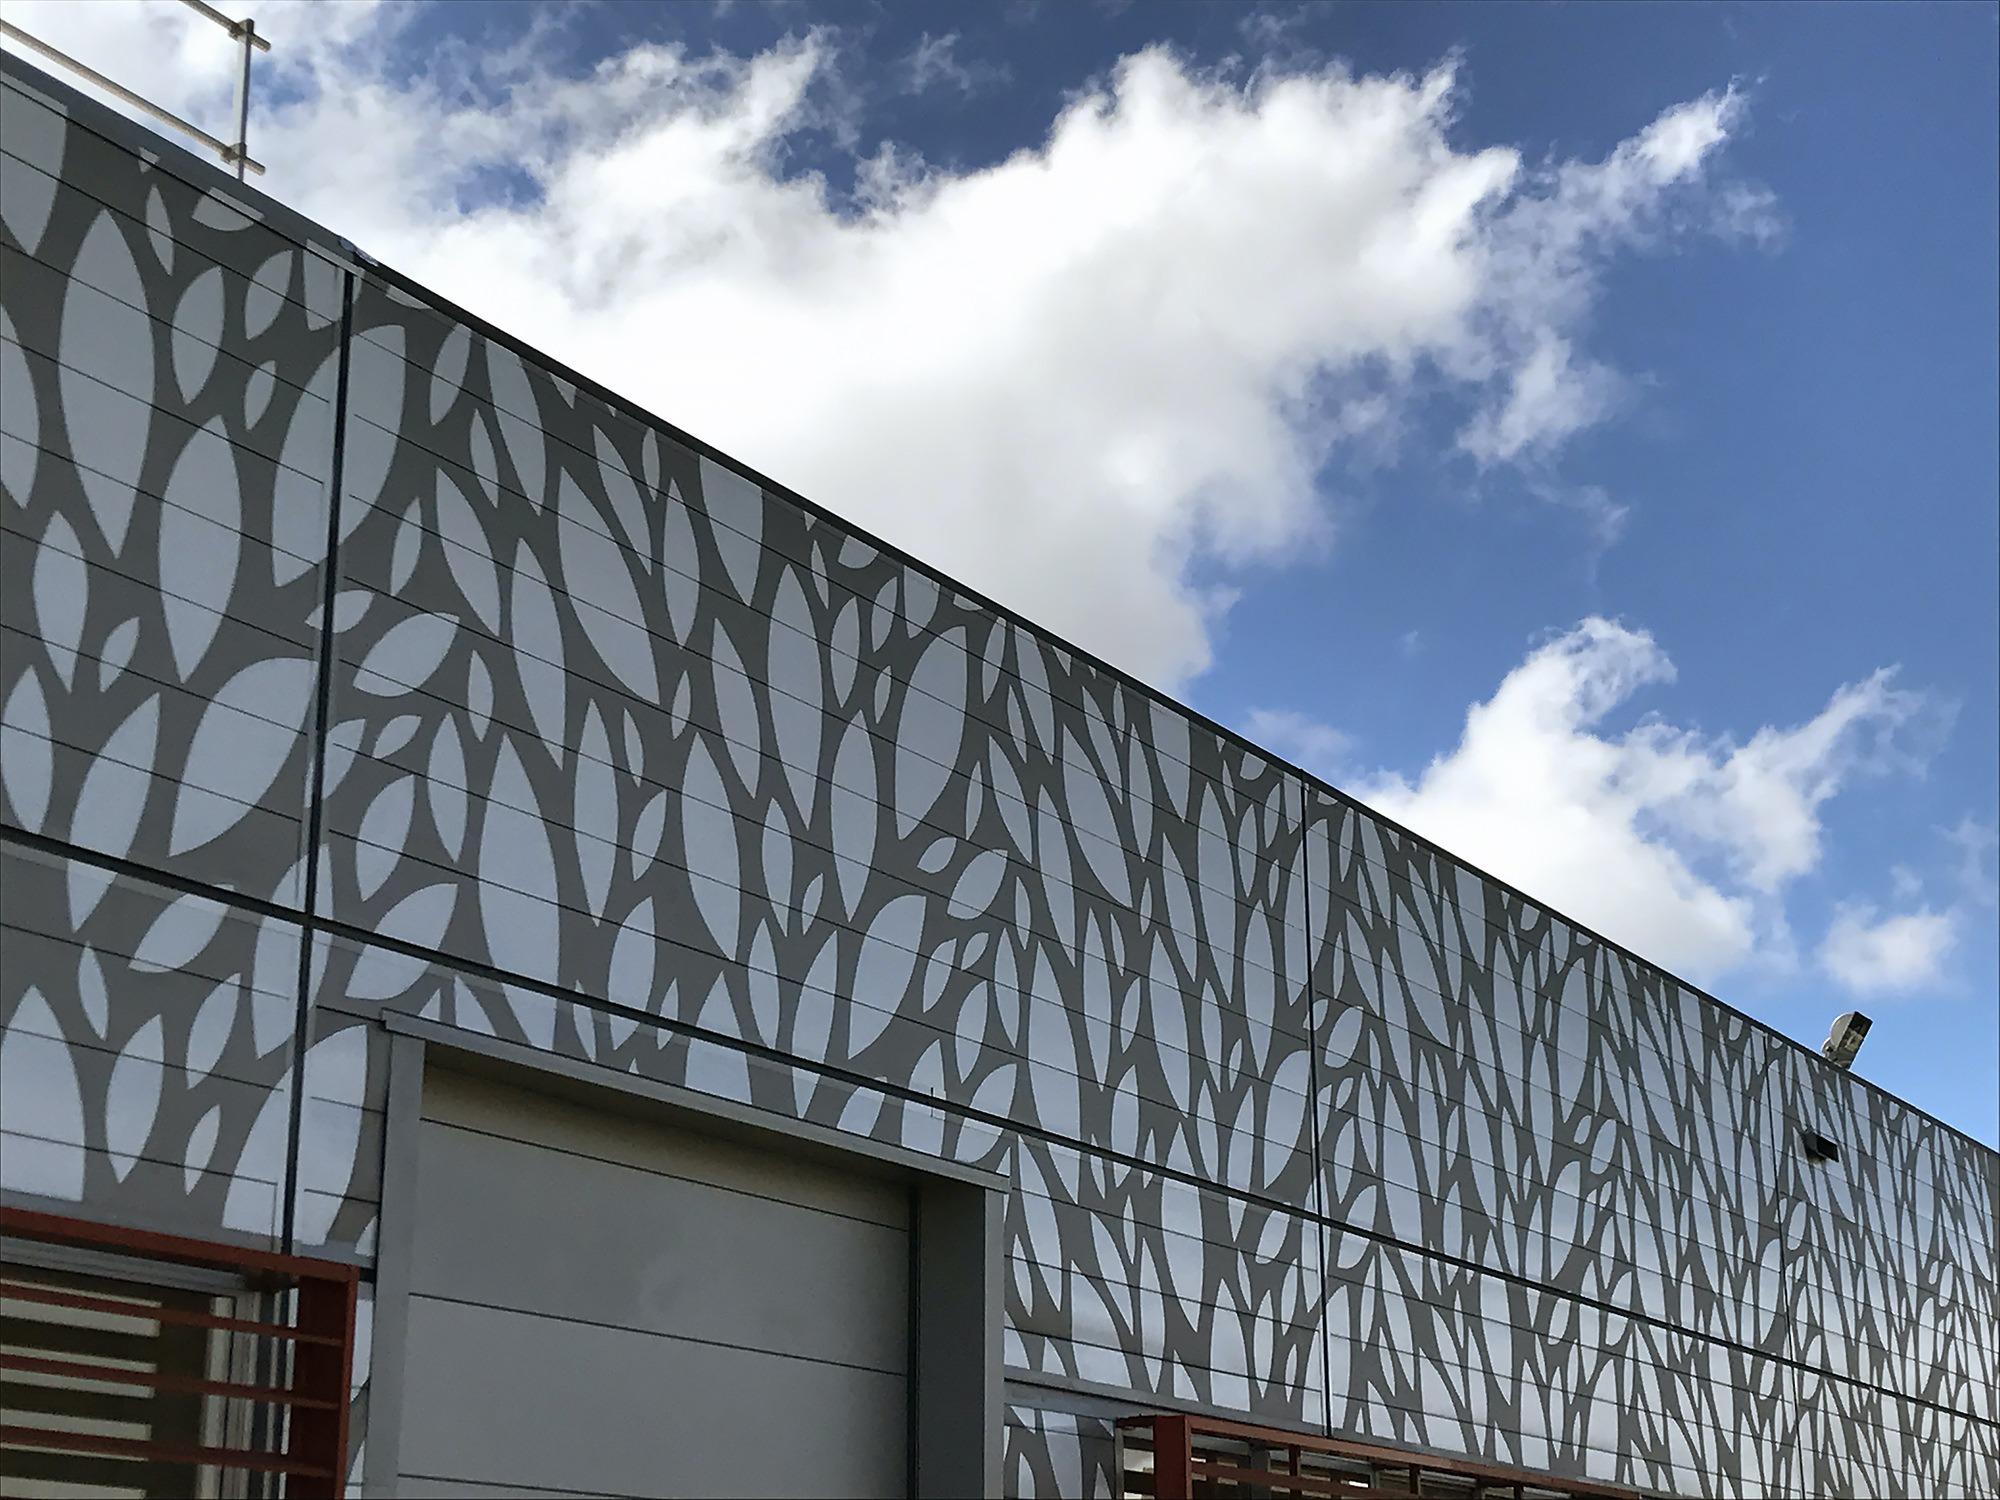 07-decoration-motif-bardage-facade